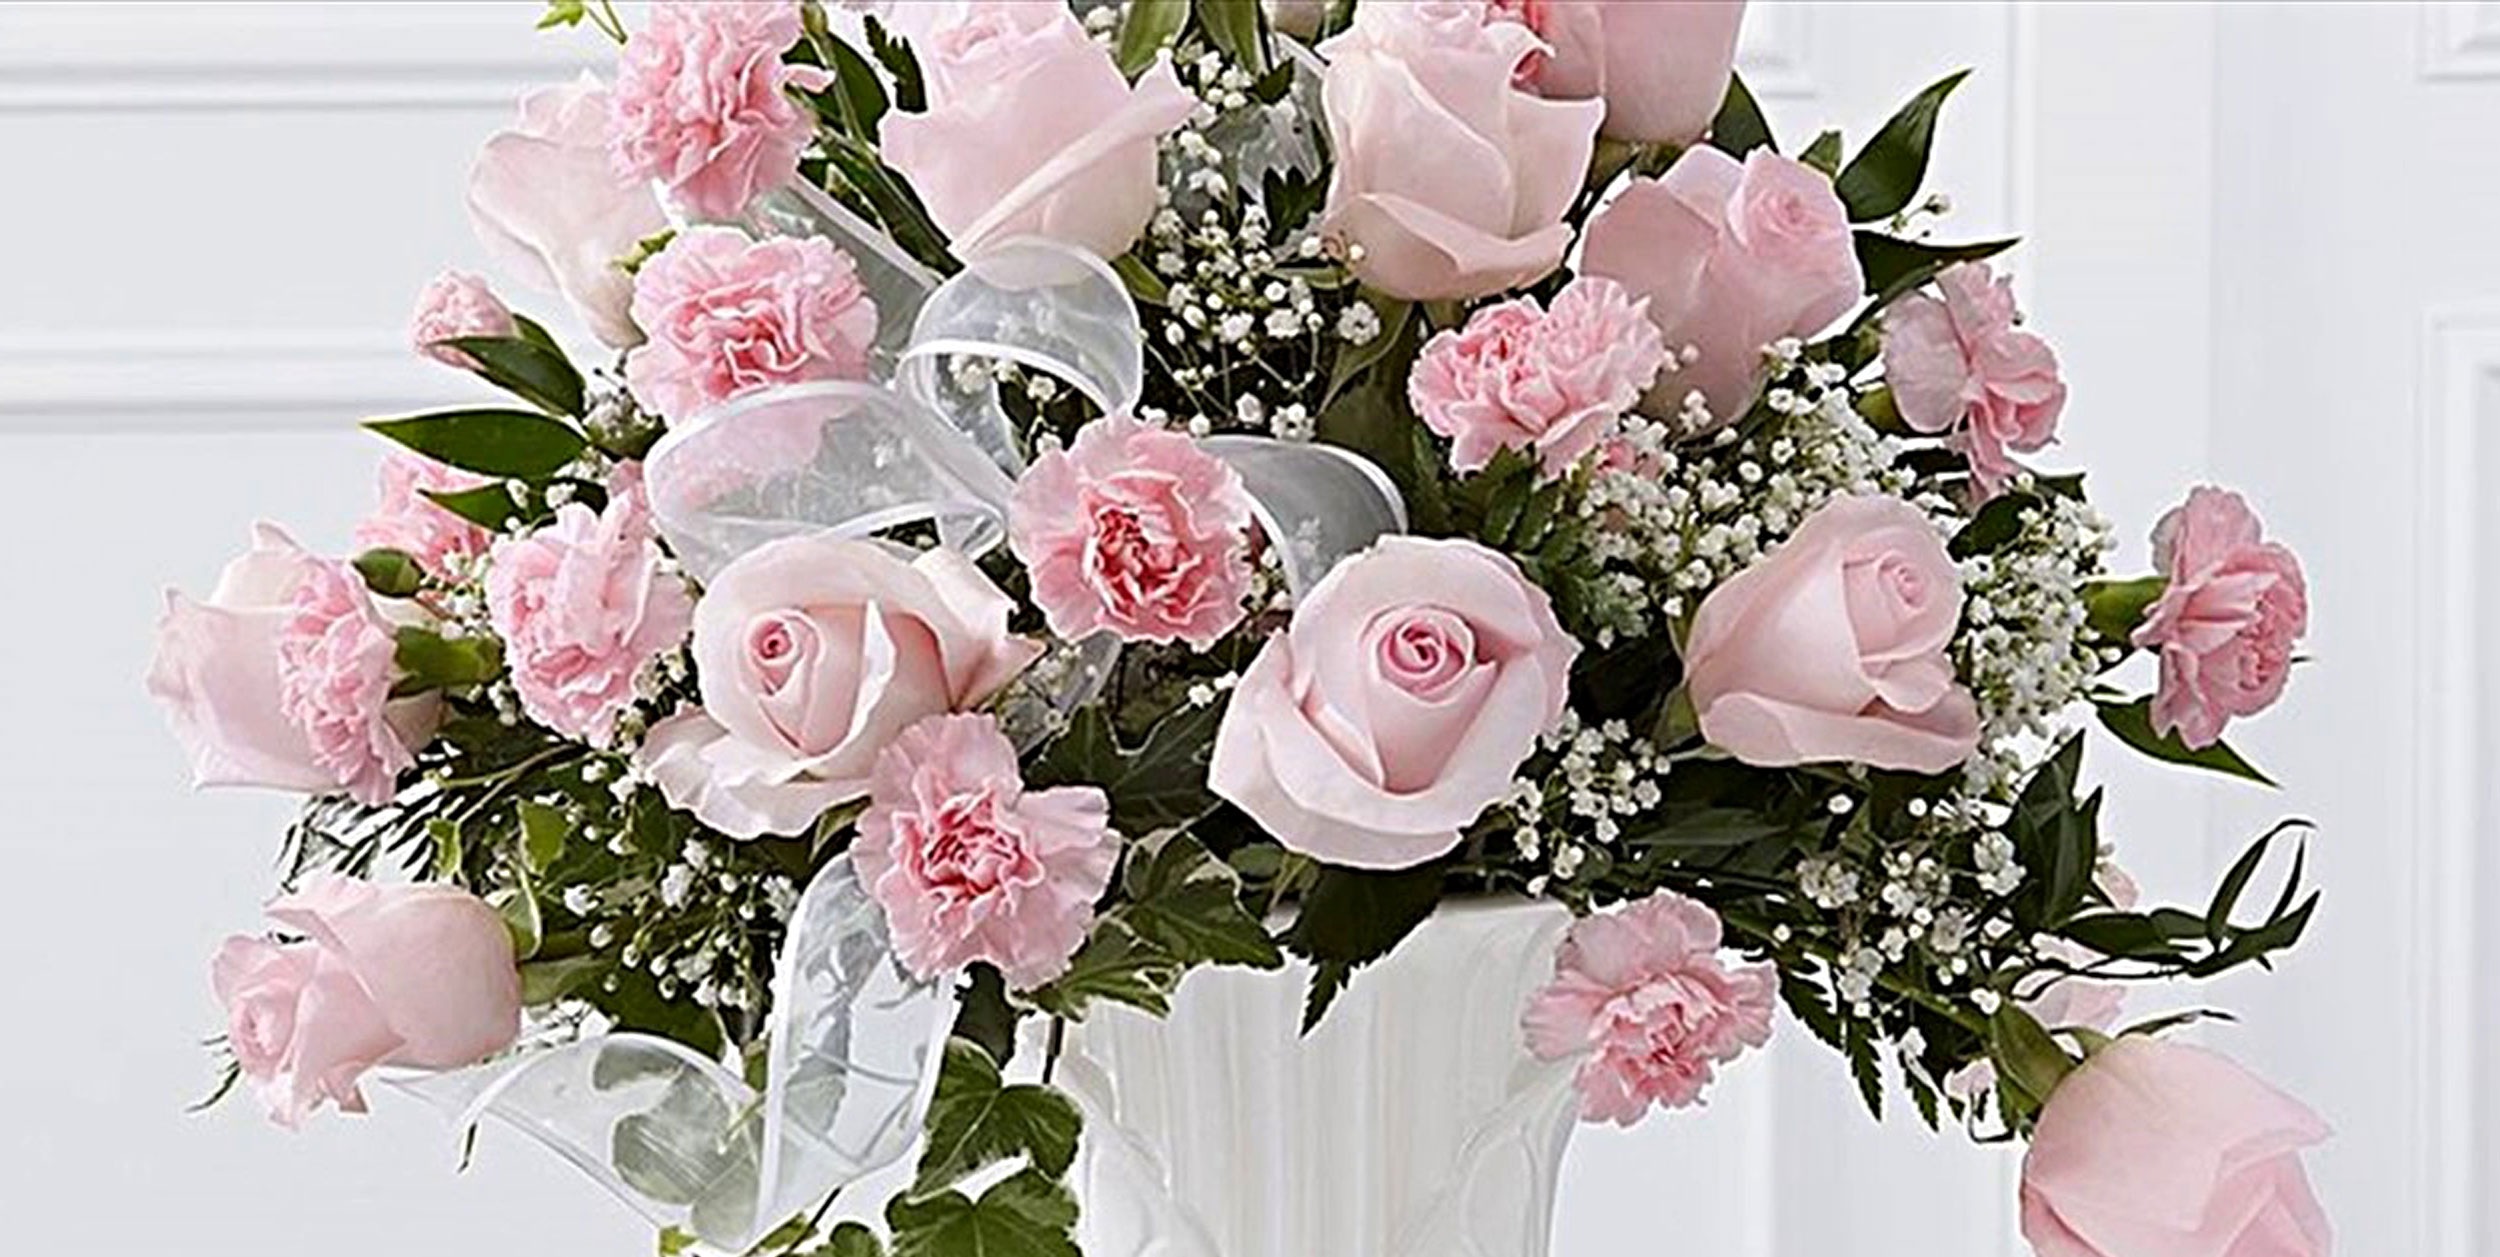 CherokeeMemorial_Banner_Flowers2.jpg